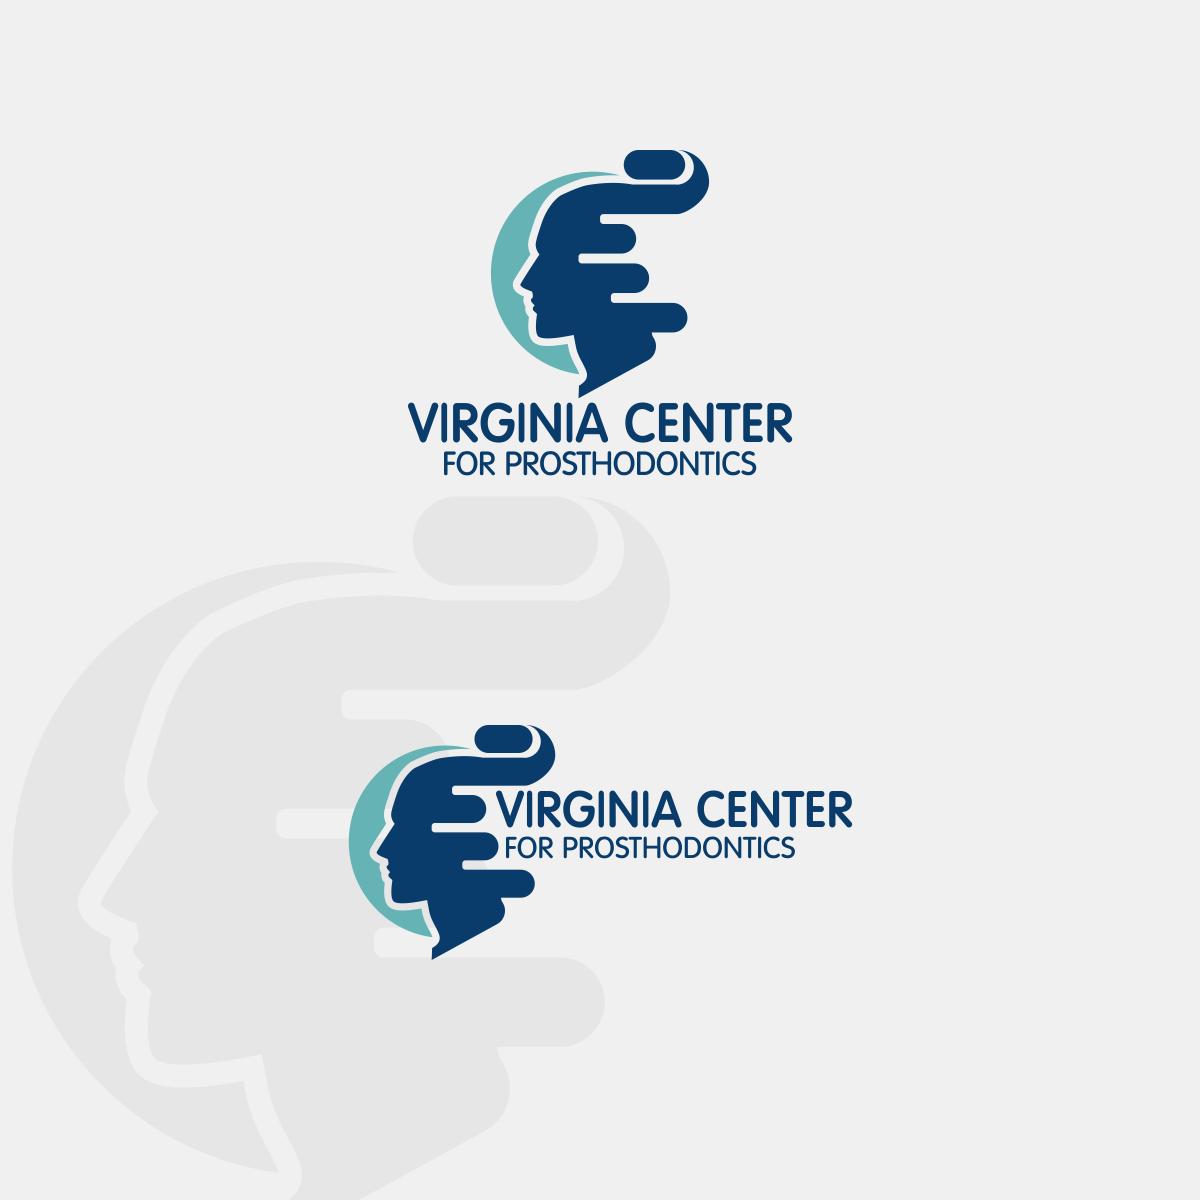 Logo Design by Private User - Entry No. 27 in the Logo Design Contest Imaginative Logo Design for Virginia Center for Prosthodontics.